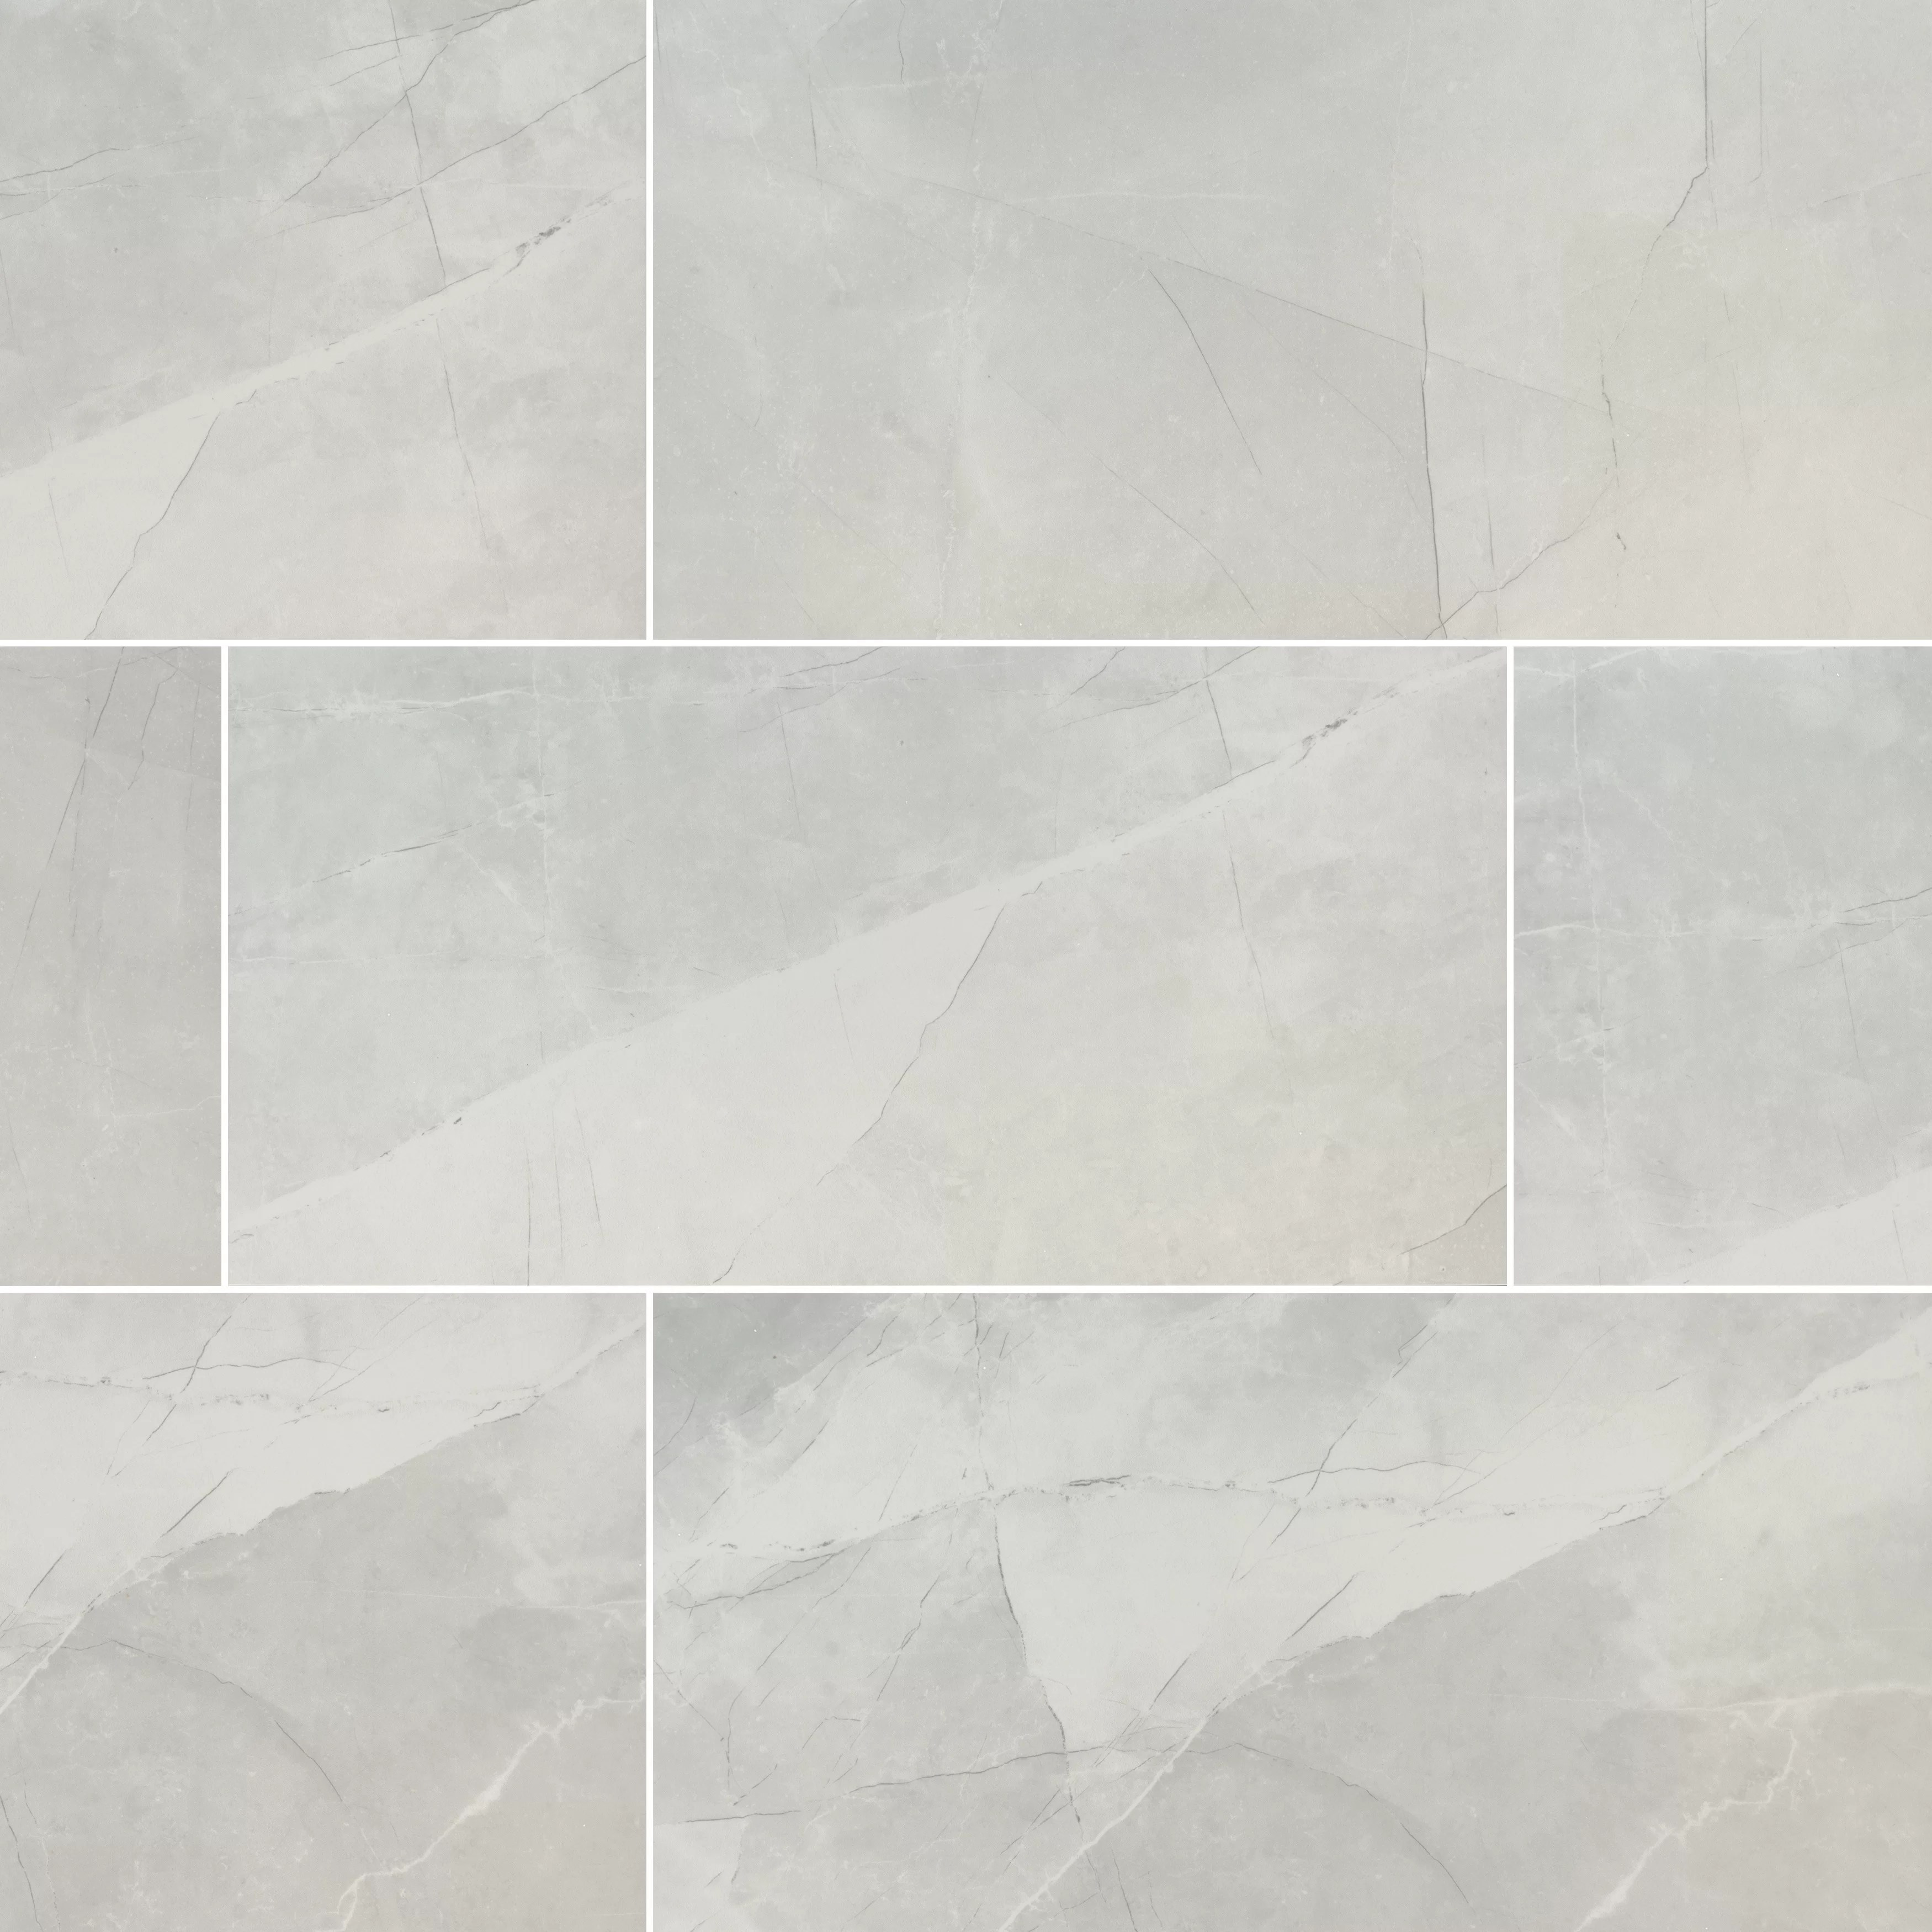 sande 24 x 48 porcelain stone look wall floor tile